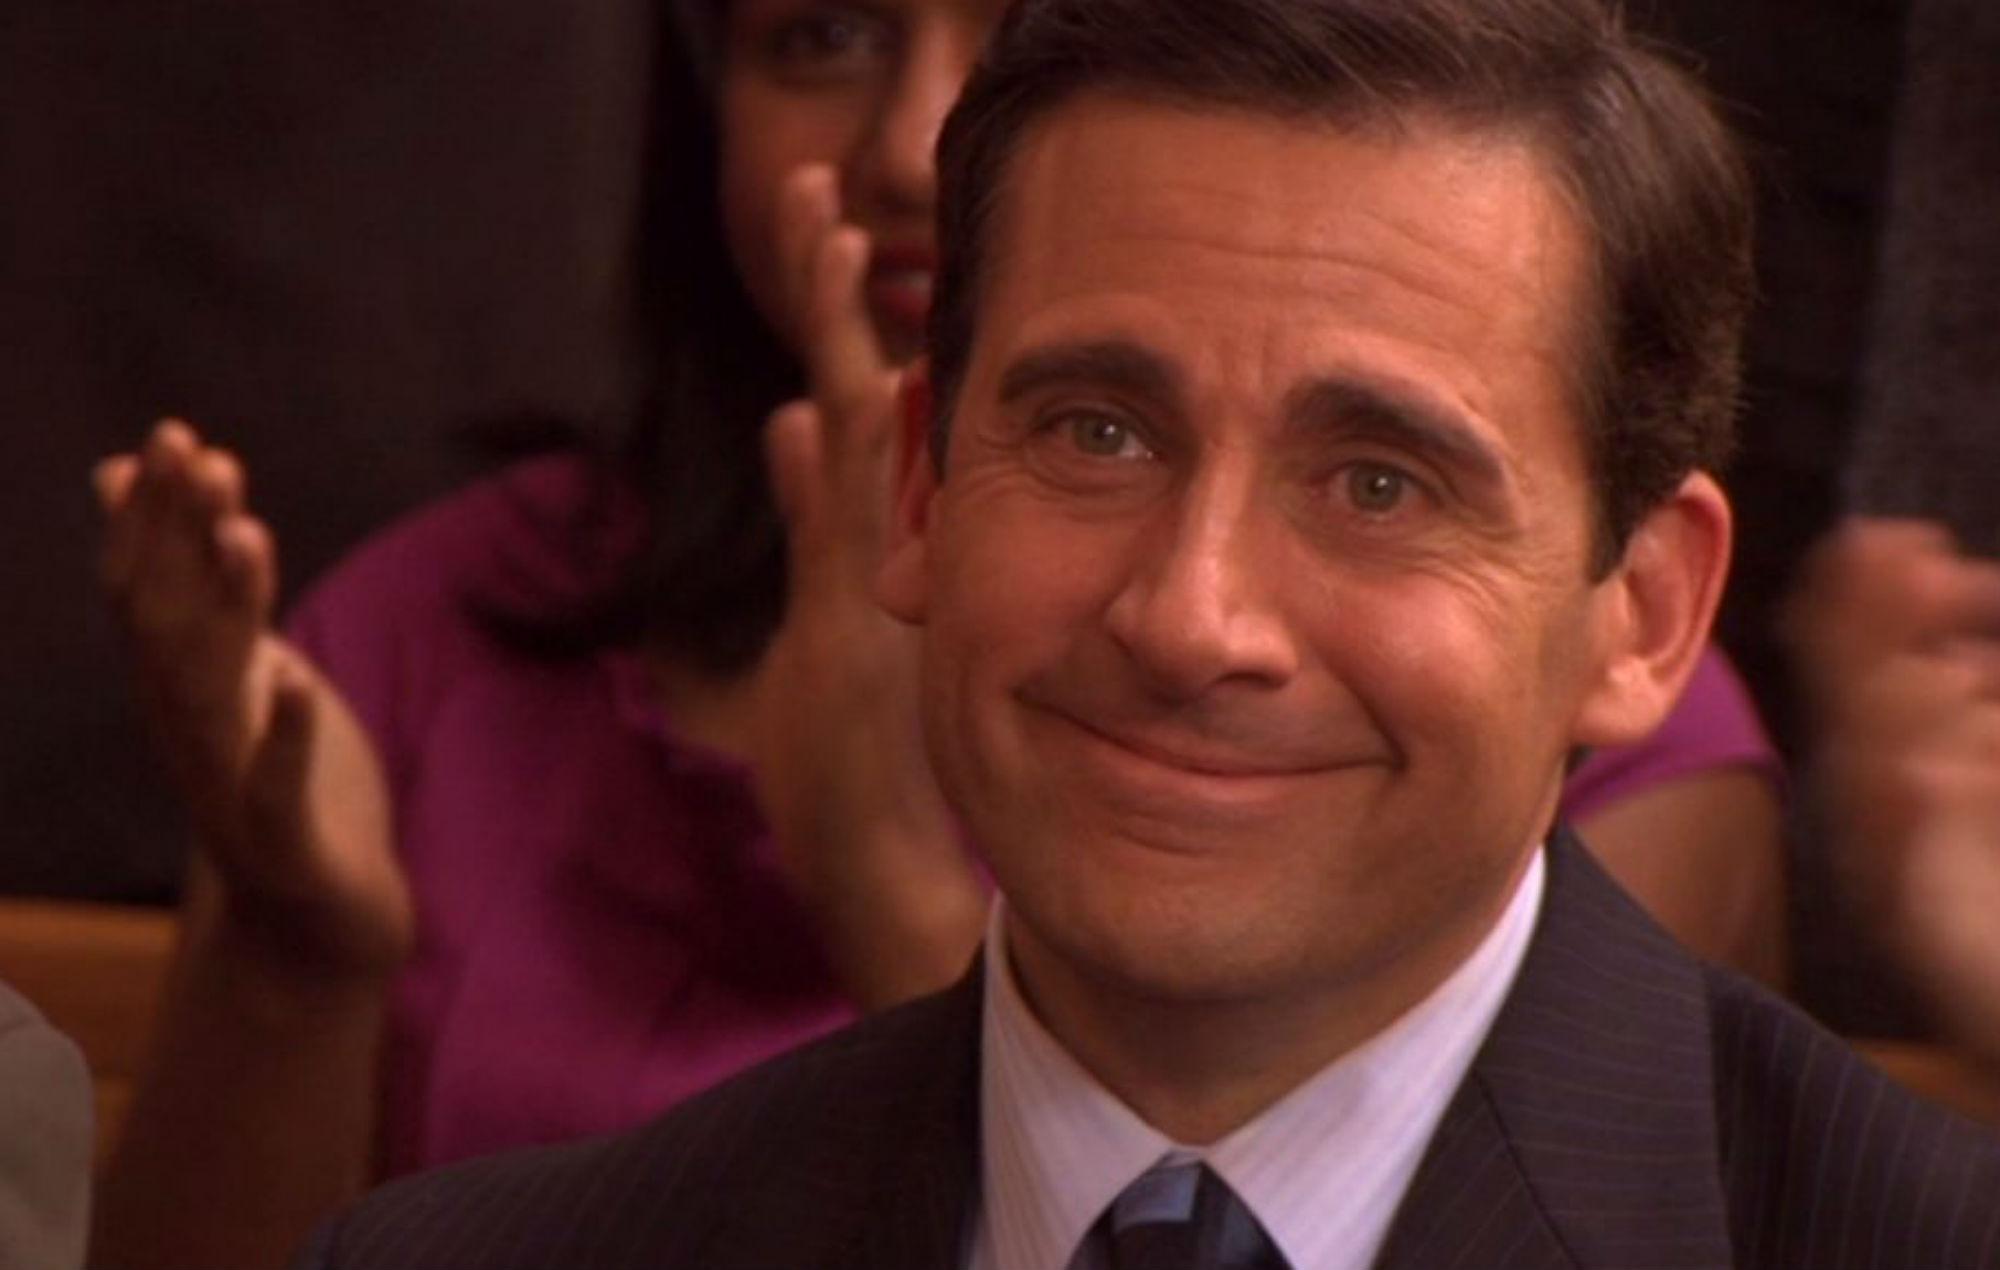 Steve Carell in 'The Office'